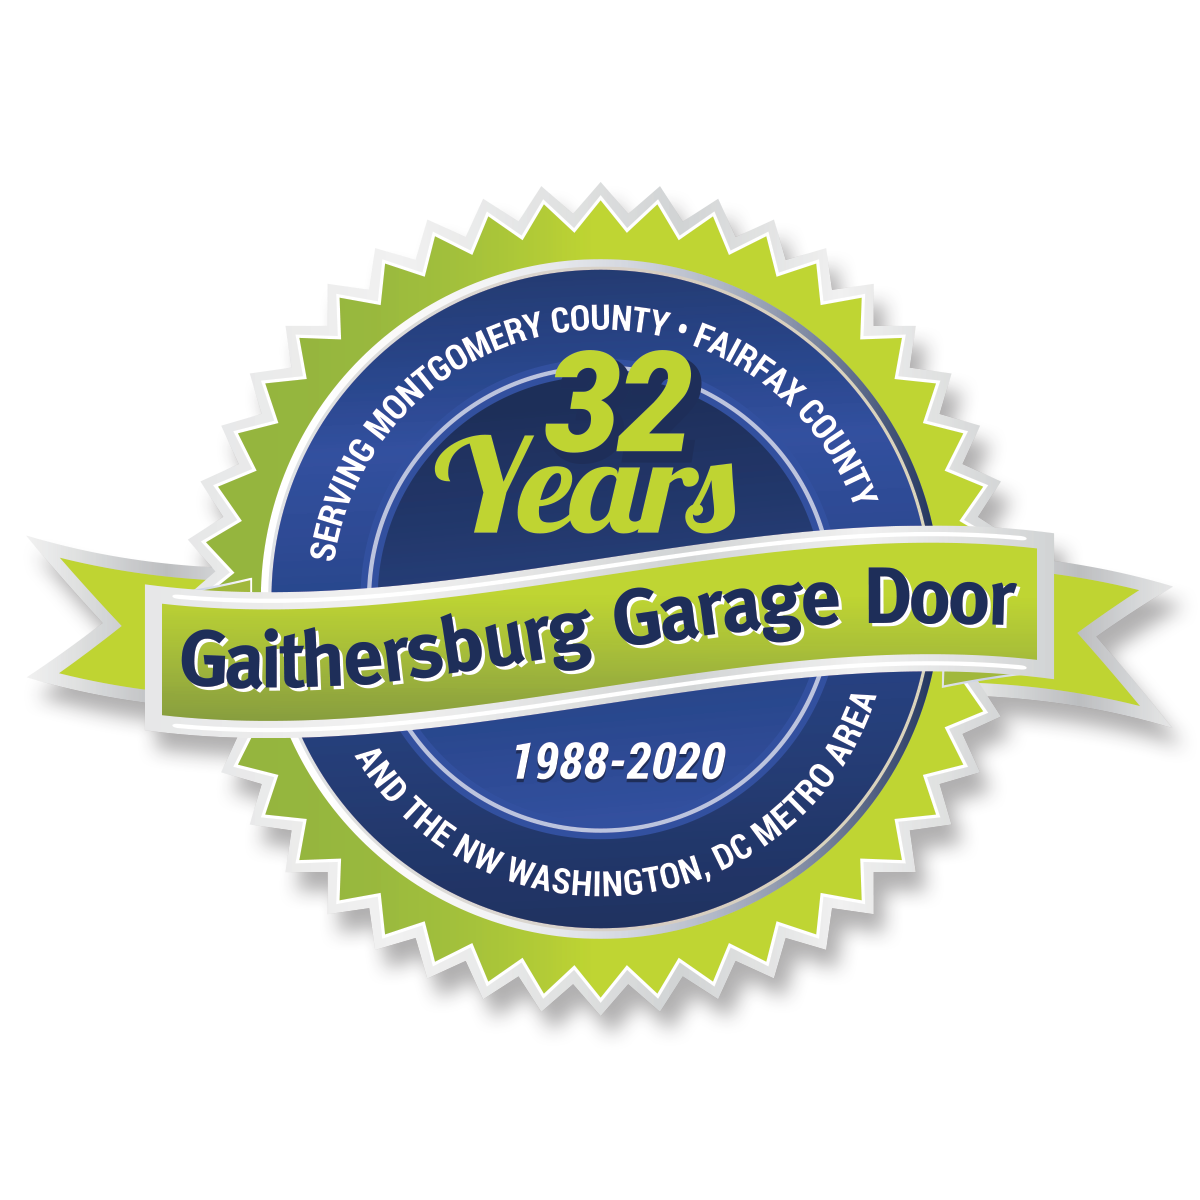 Gaithersburg Garage Door Inc logo